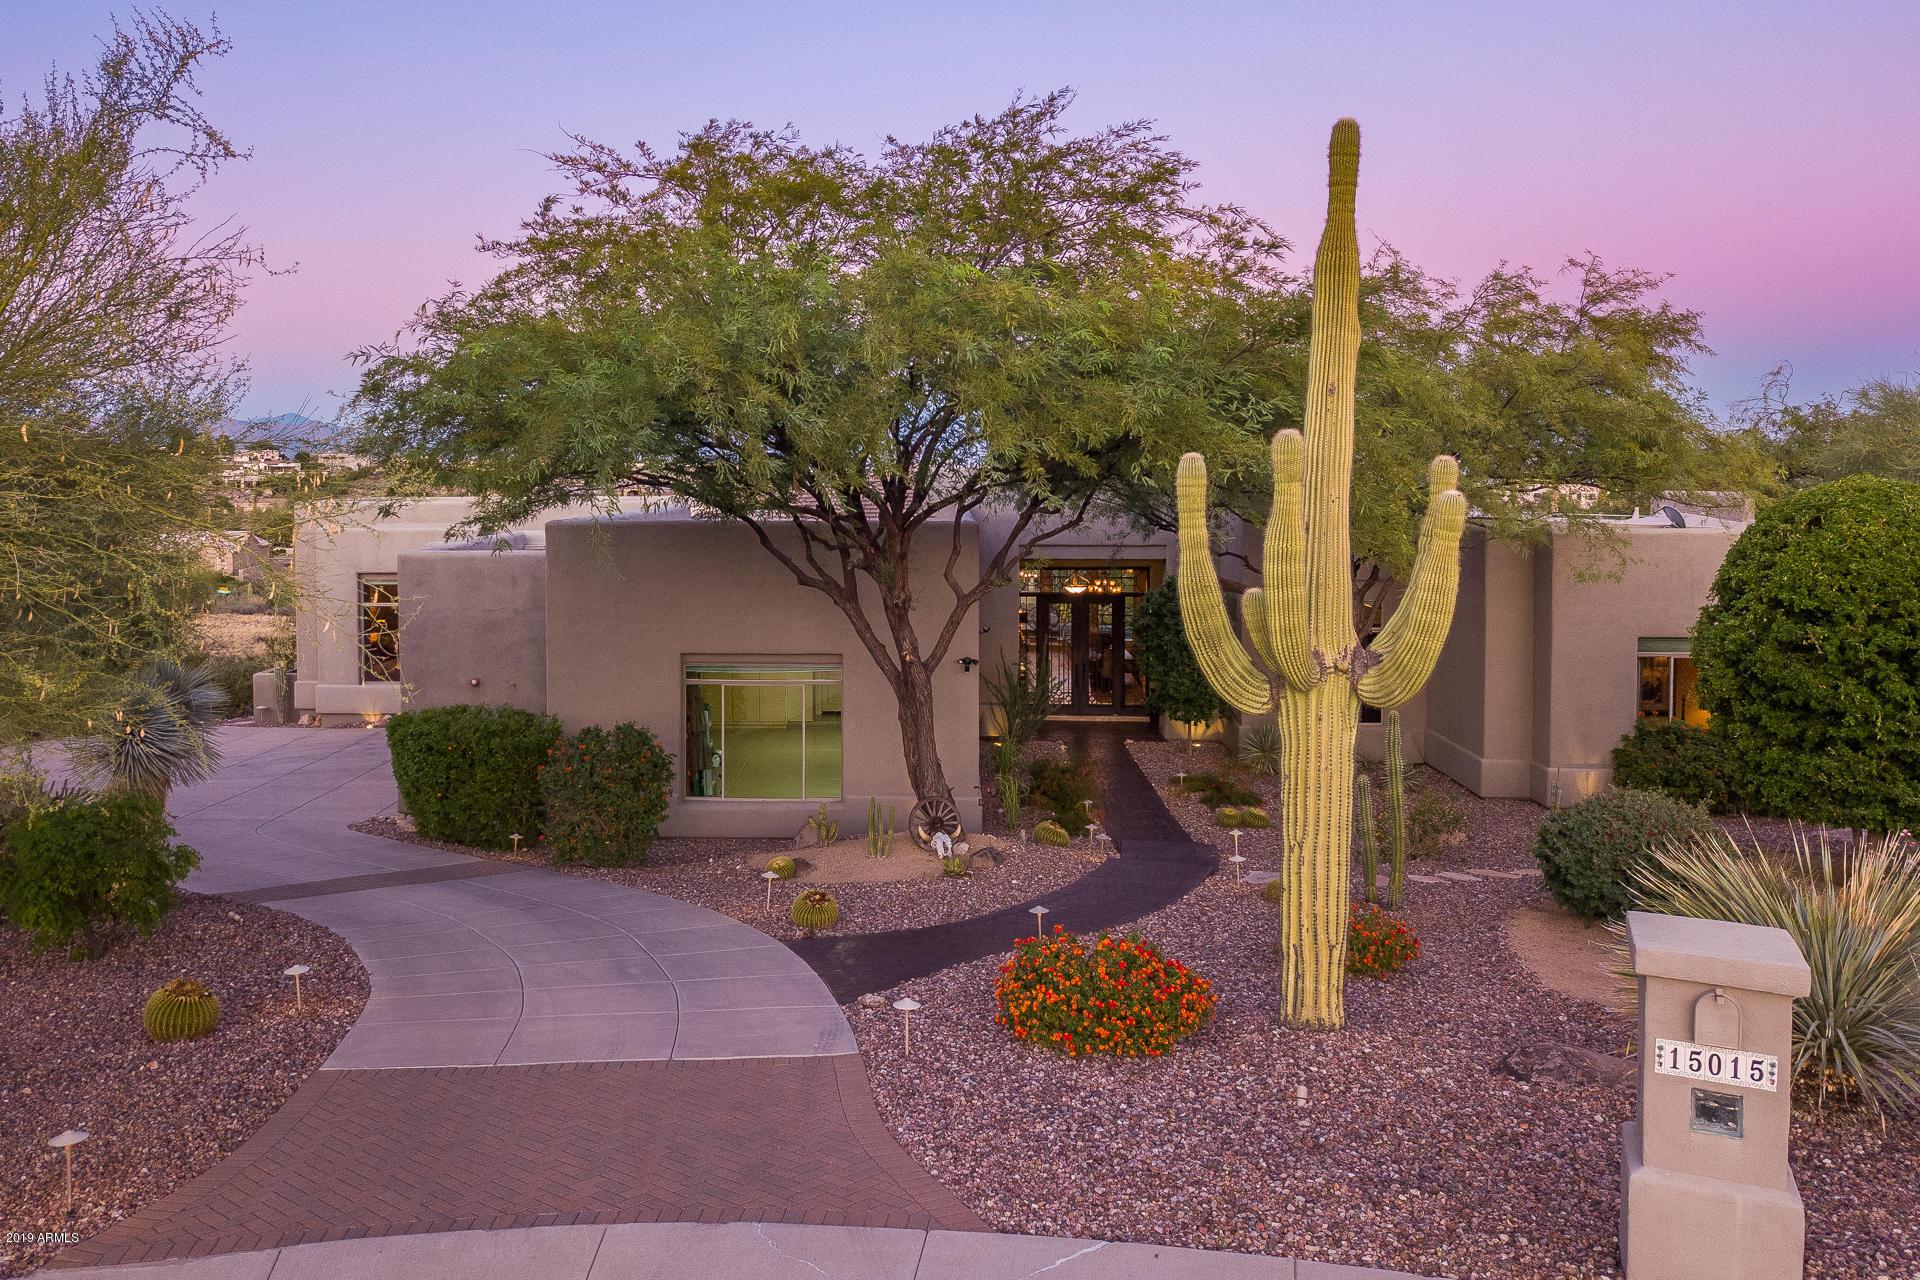 Photo of 15015 N WREN Court, Fountain Hills, AZ 85268